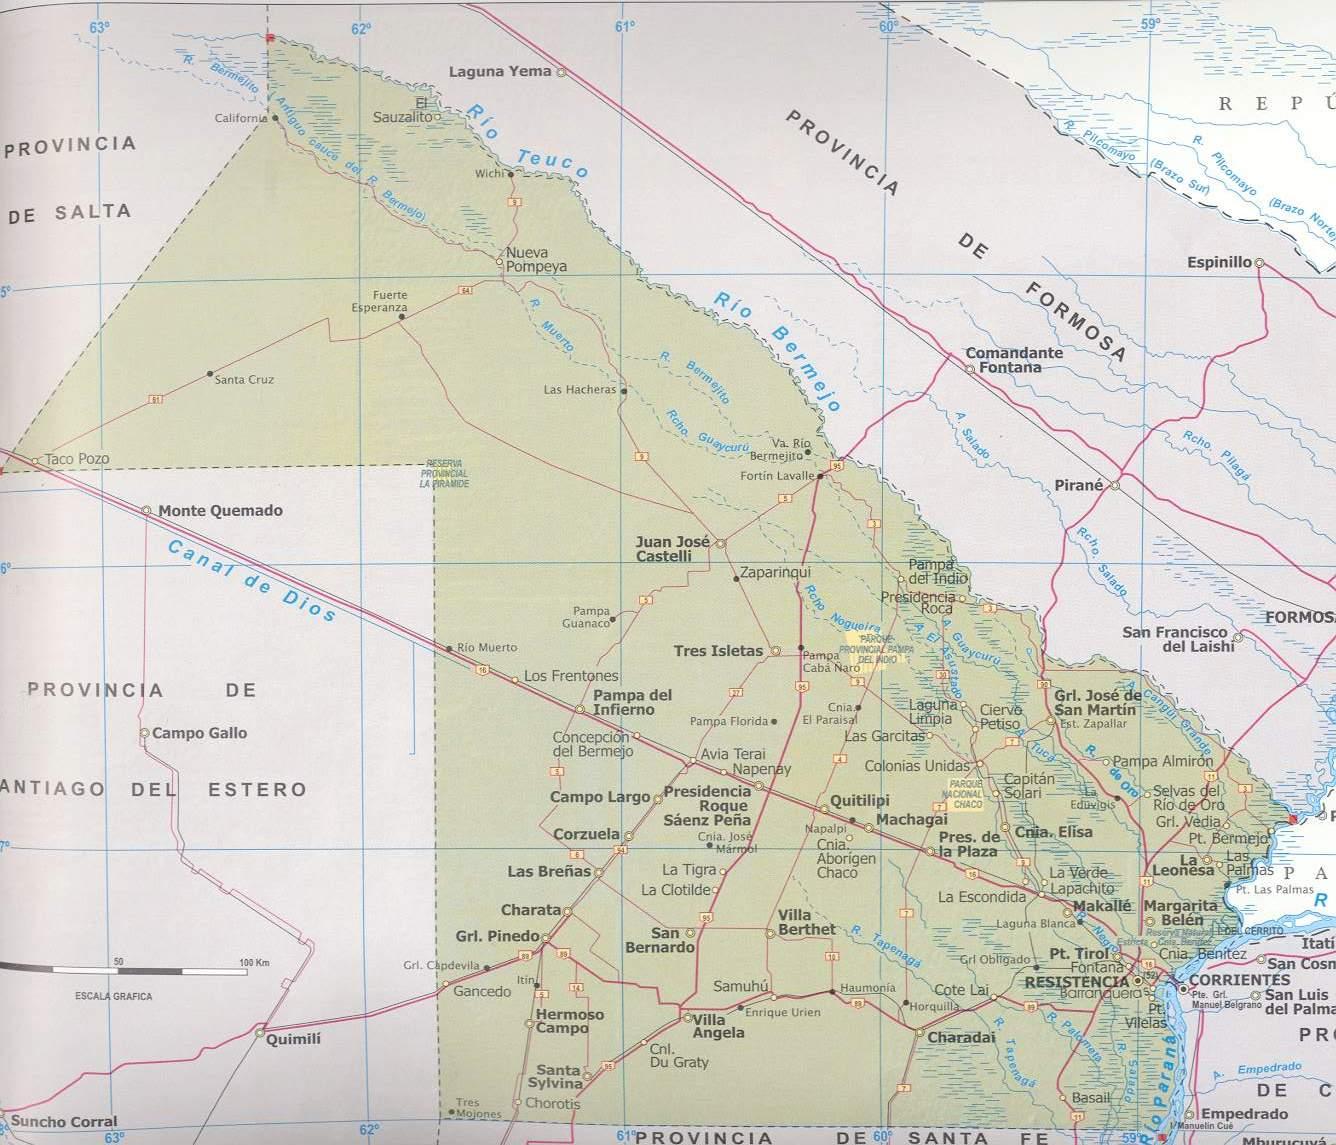 Mapa Provincia de Chaco, Argentina